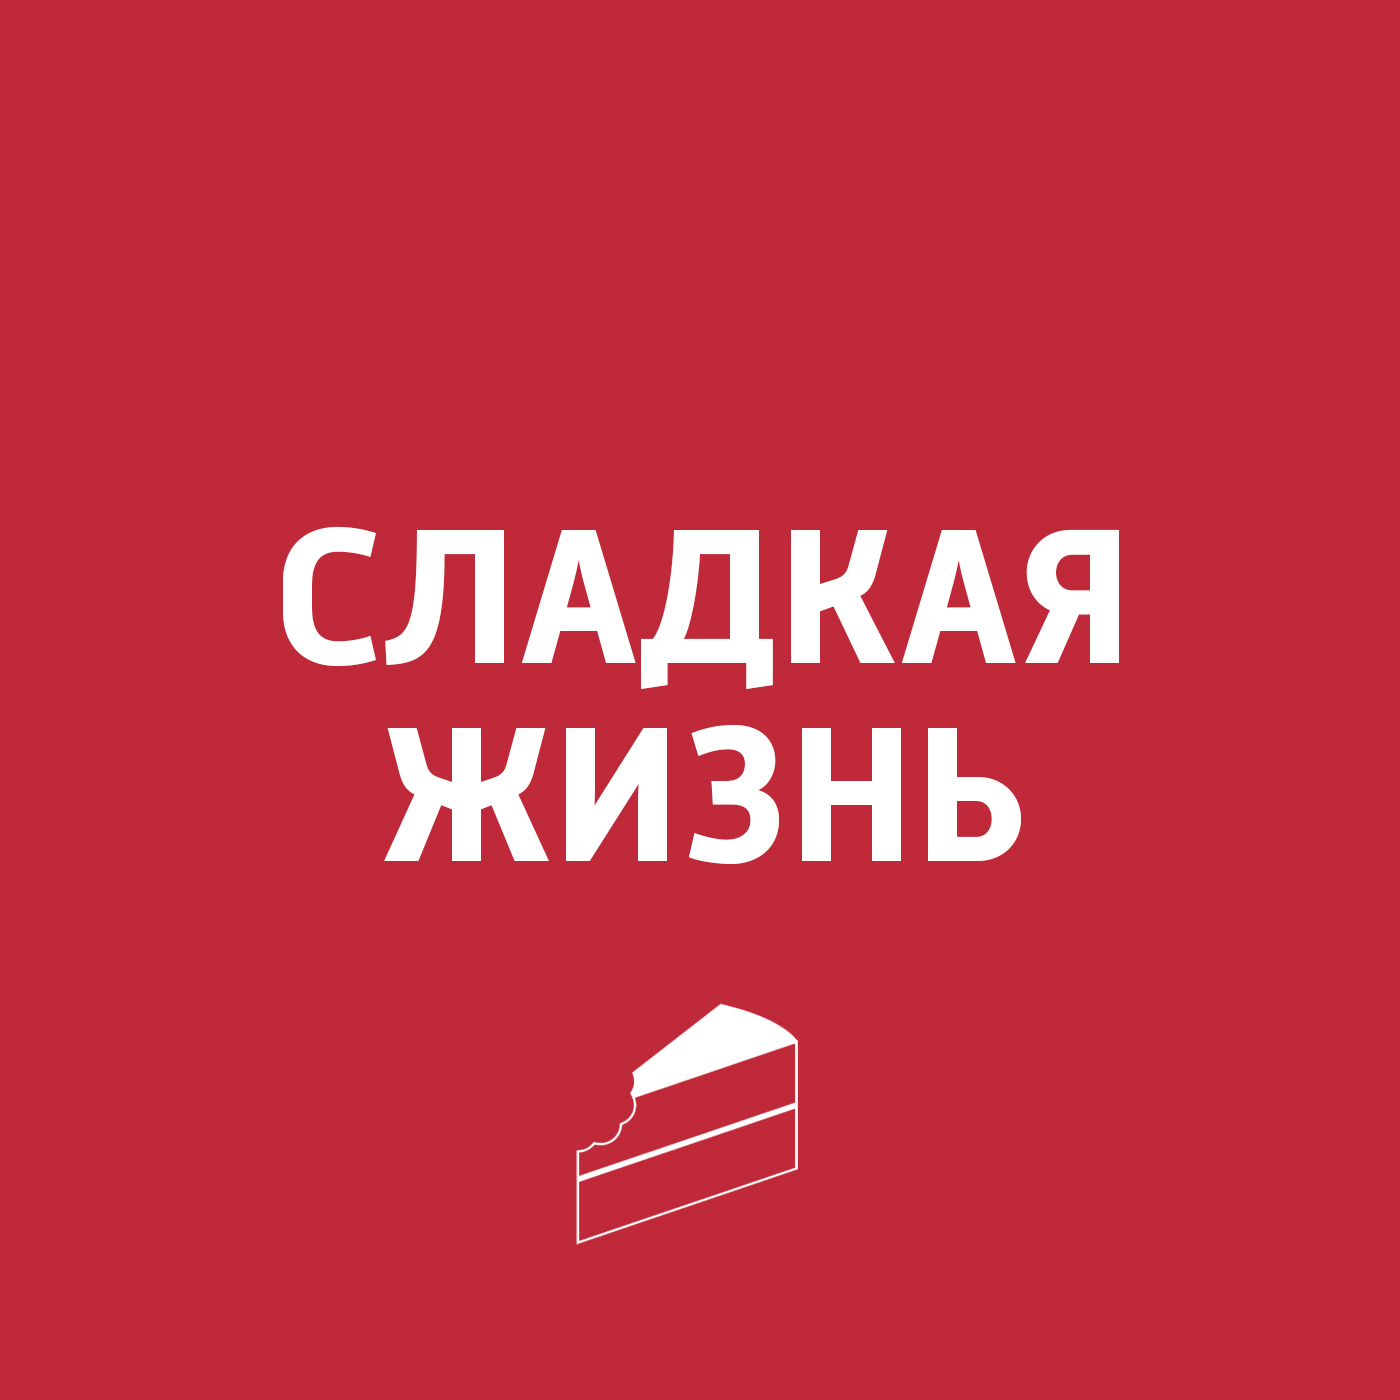 Картаев Павел Сухари картаев павел чуррос